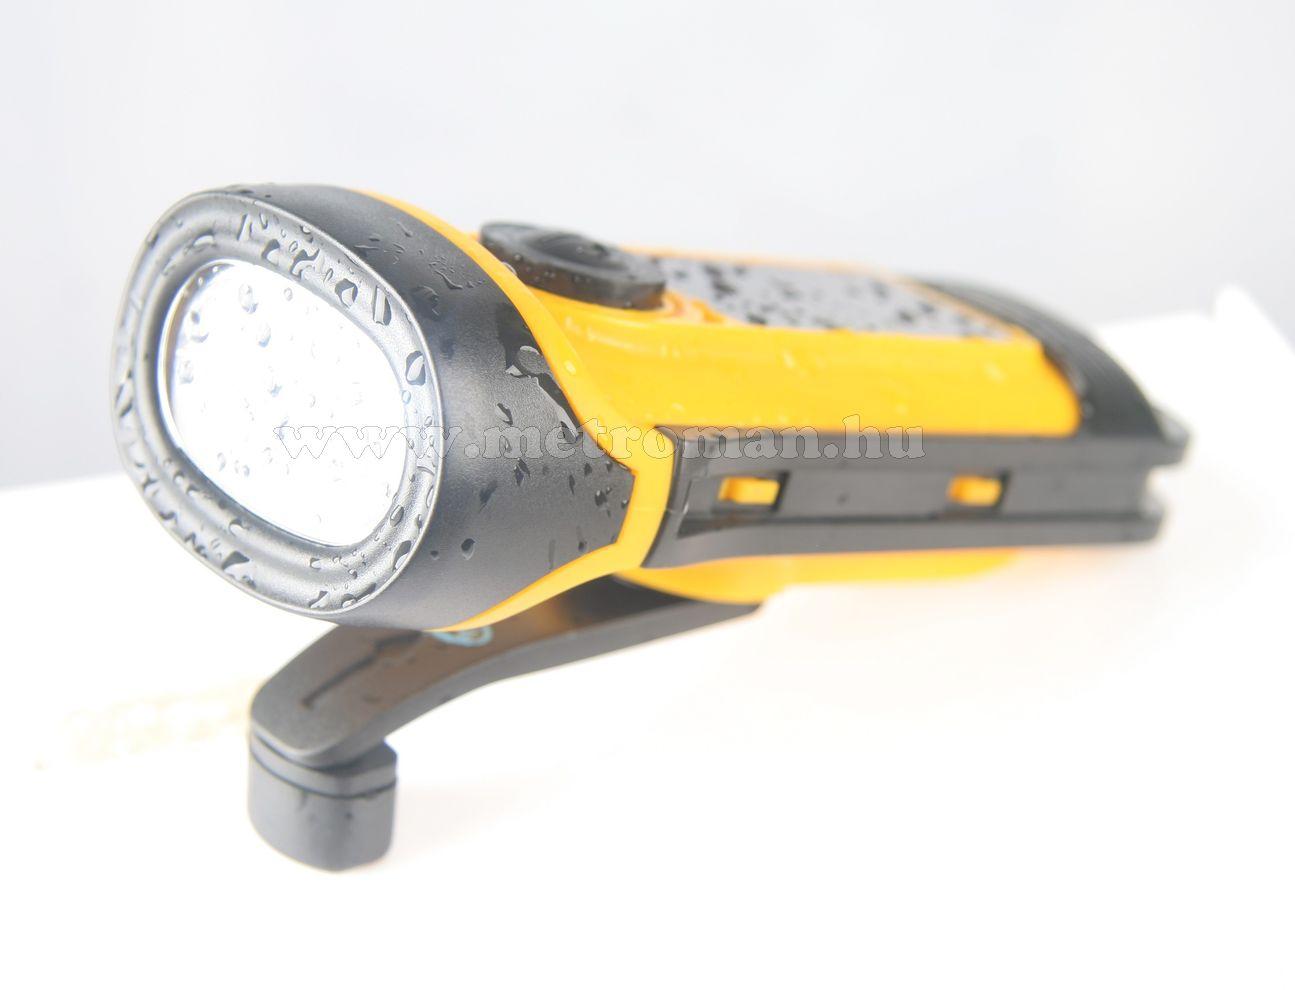 Evolve Twister napelemes - dinamós vízálló LED lámpa